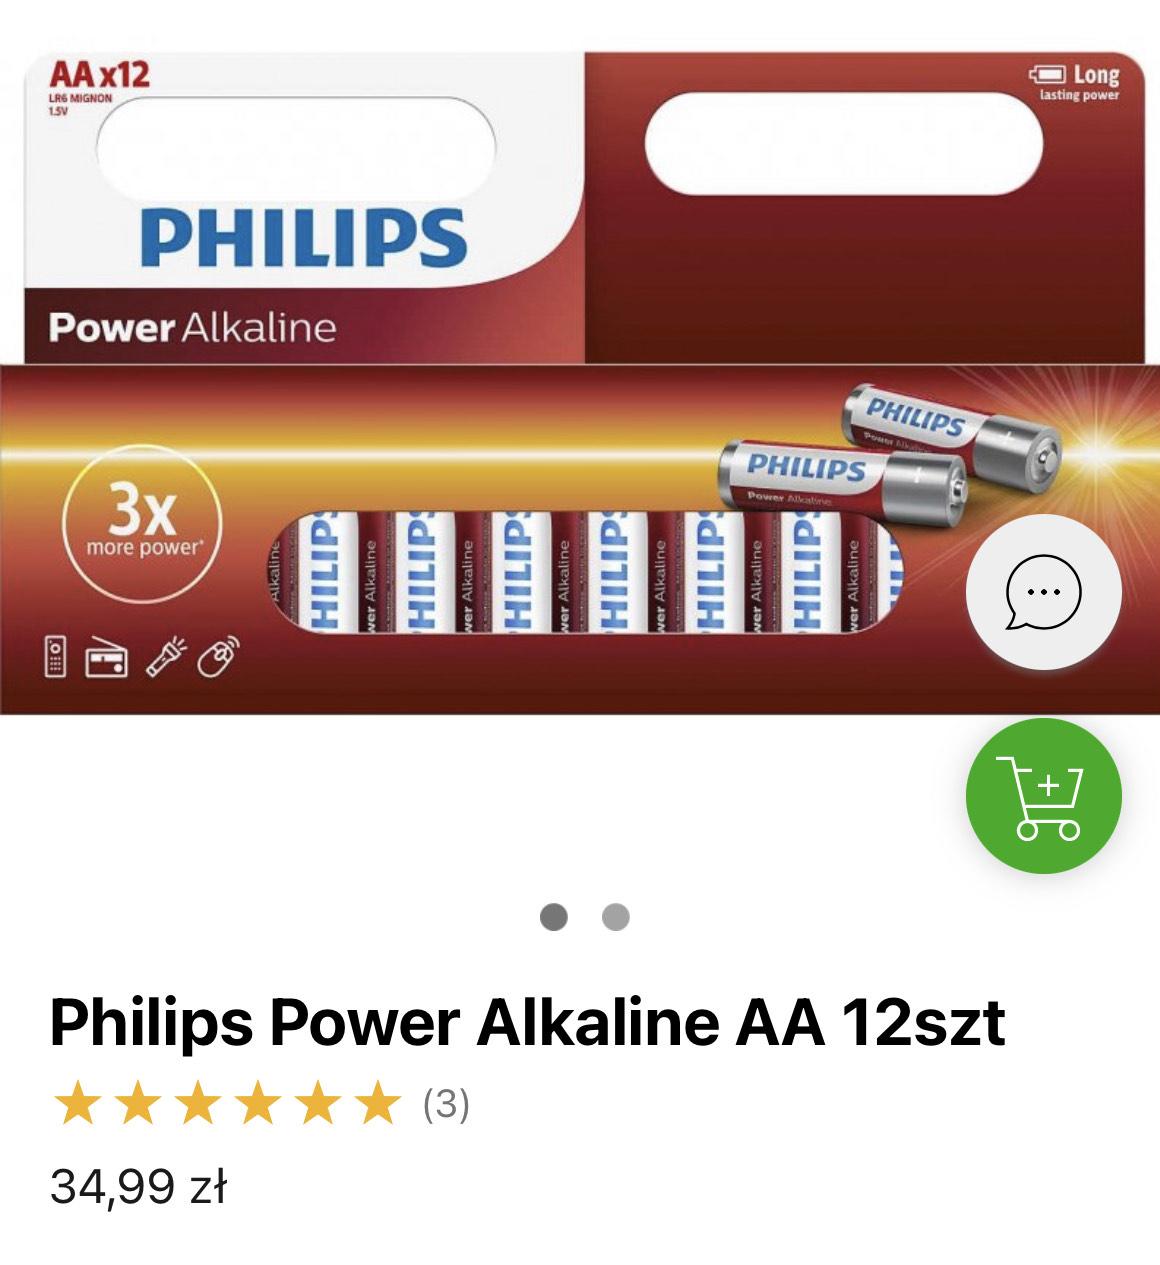 Baterie Philips Power Alkaline AA 12szt lub AAA